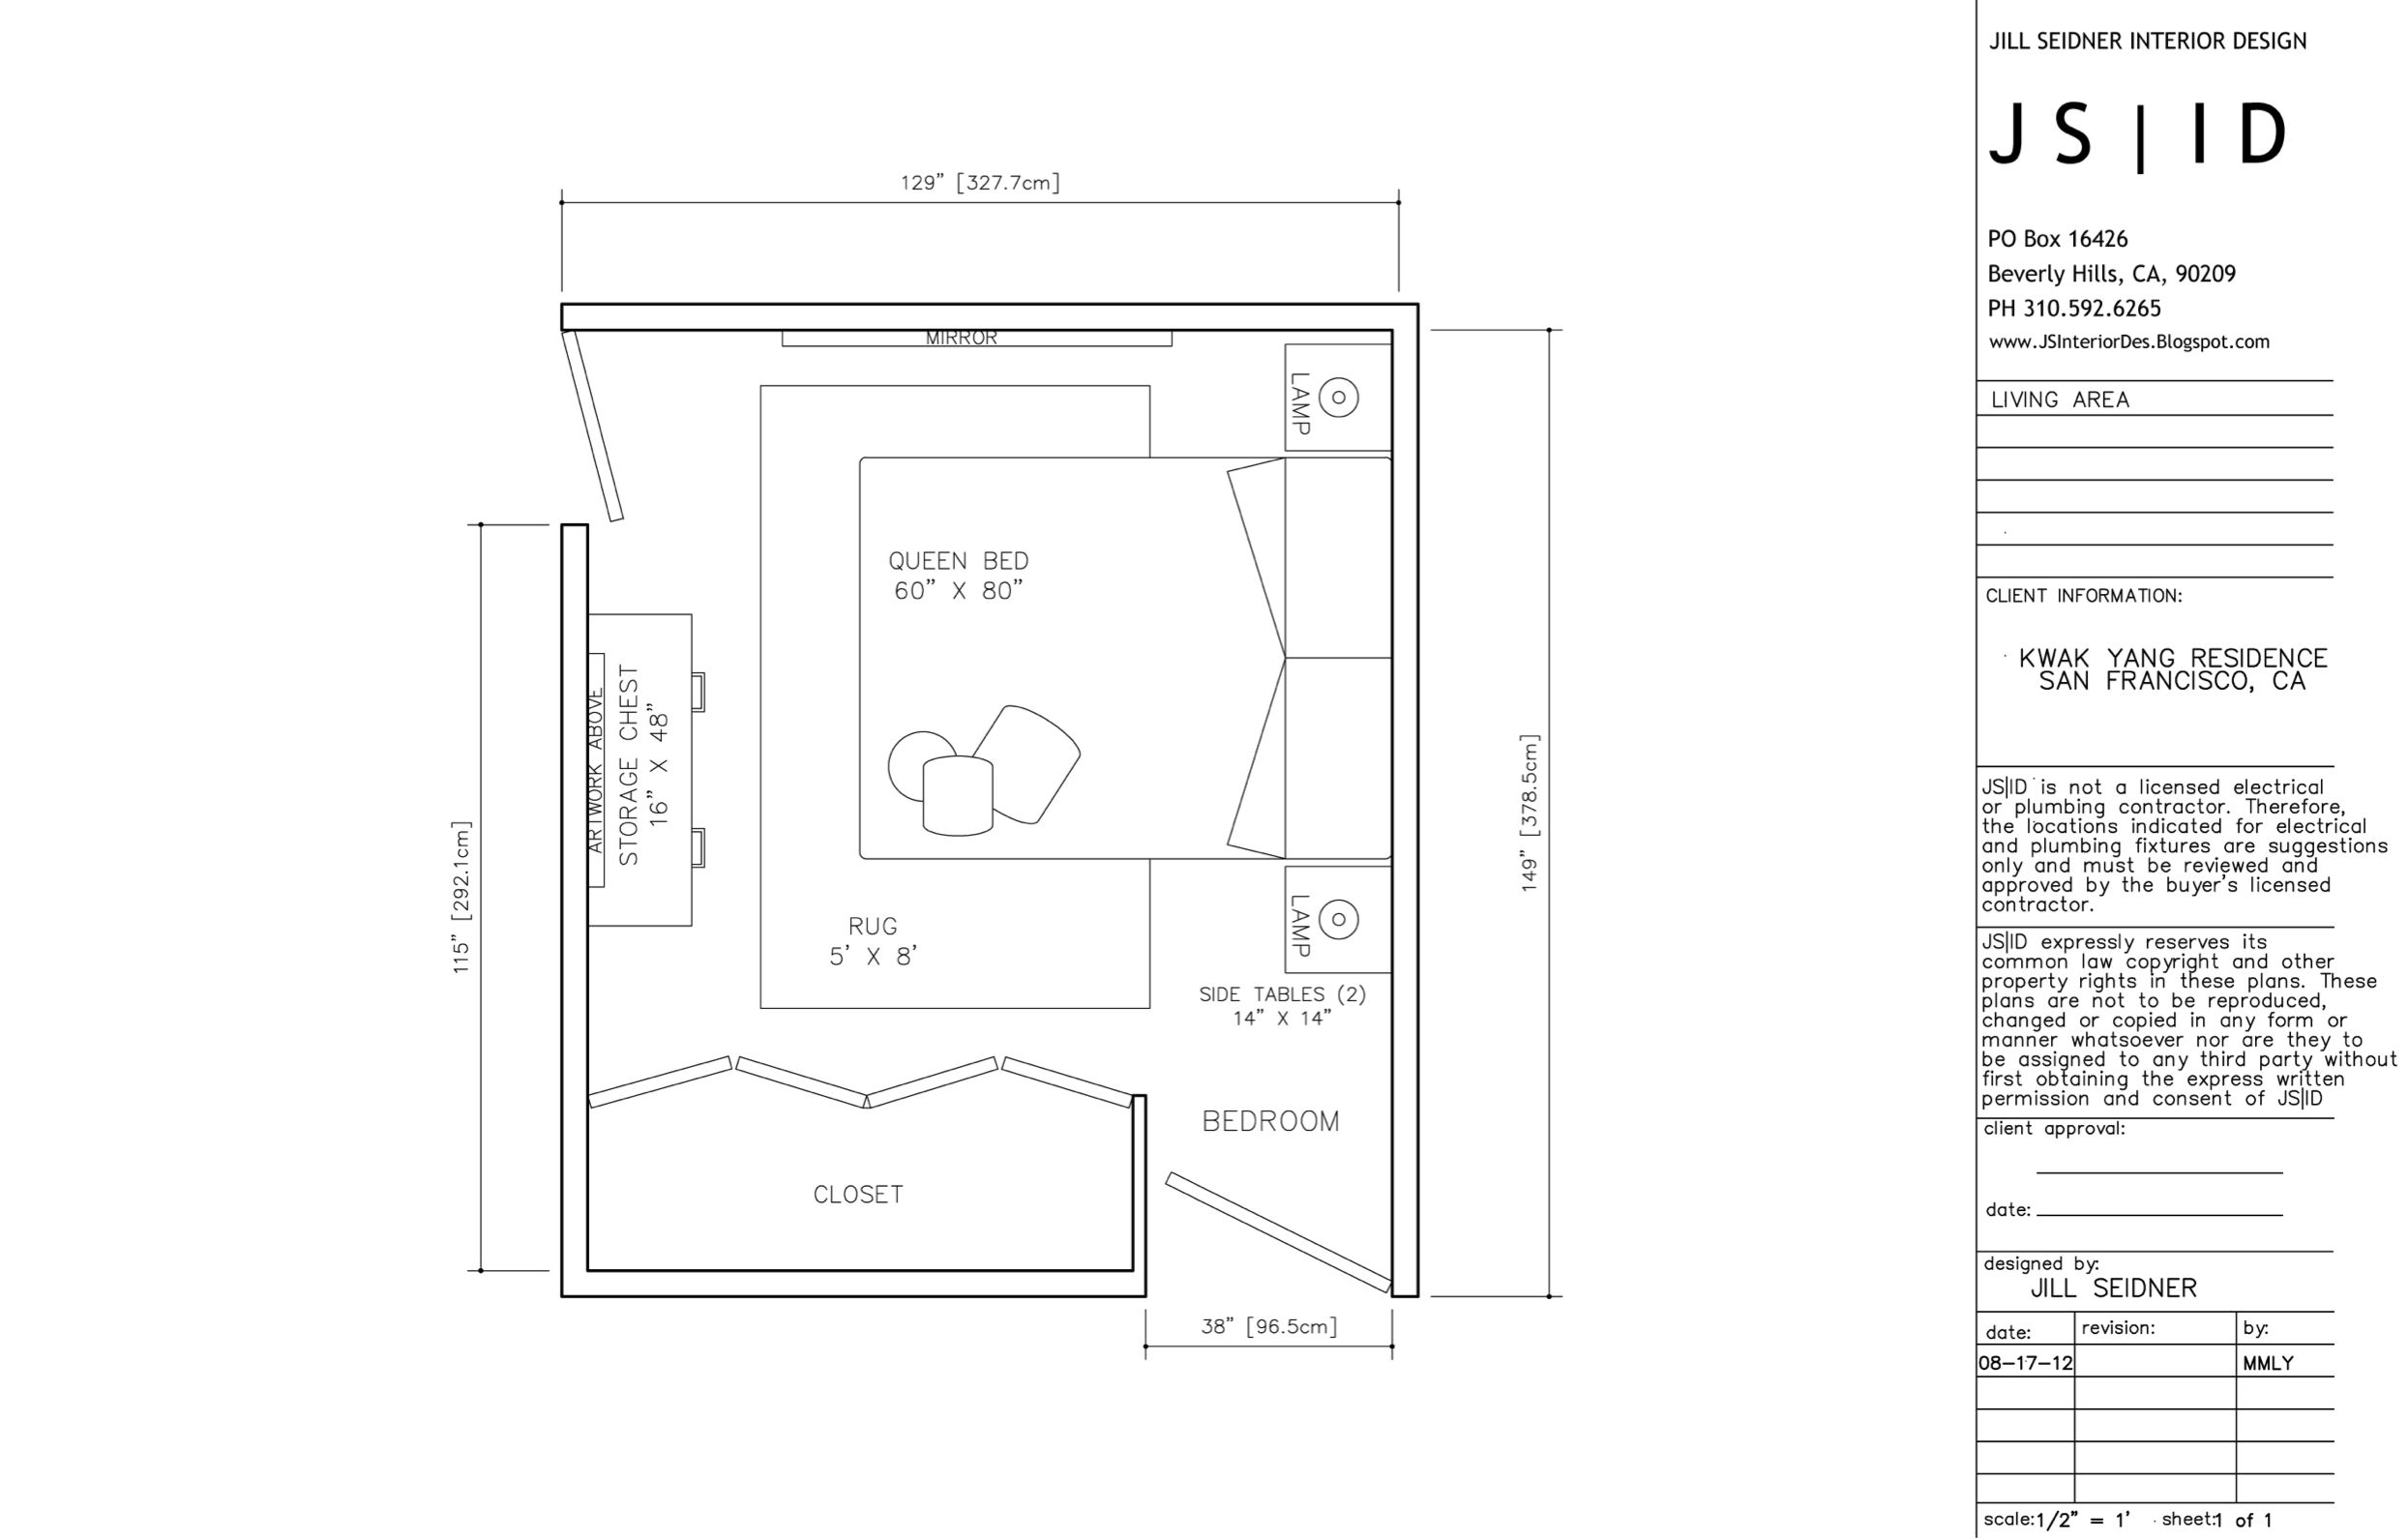 Master bedroom furniture plan - San Francisco Ca Online Design Project Master Bedroom Furniture Floor Plan Layout Option